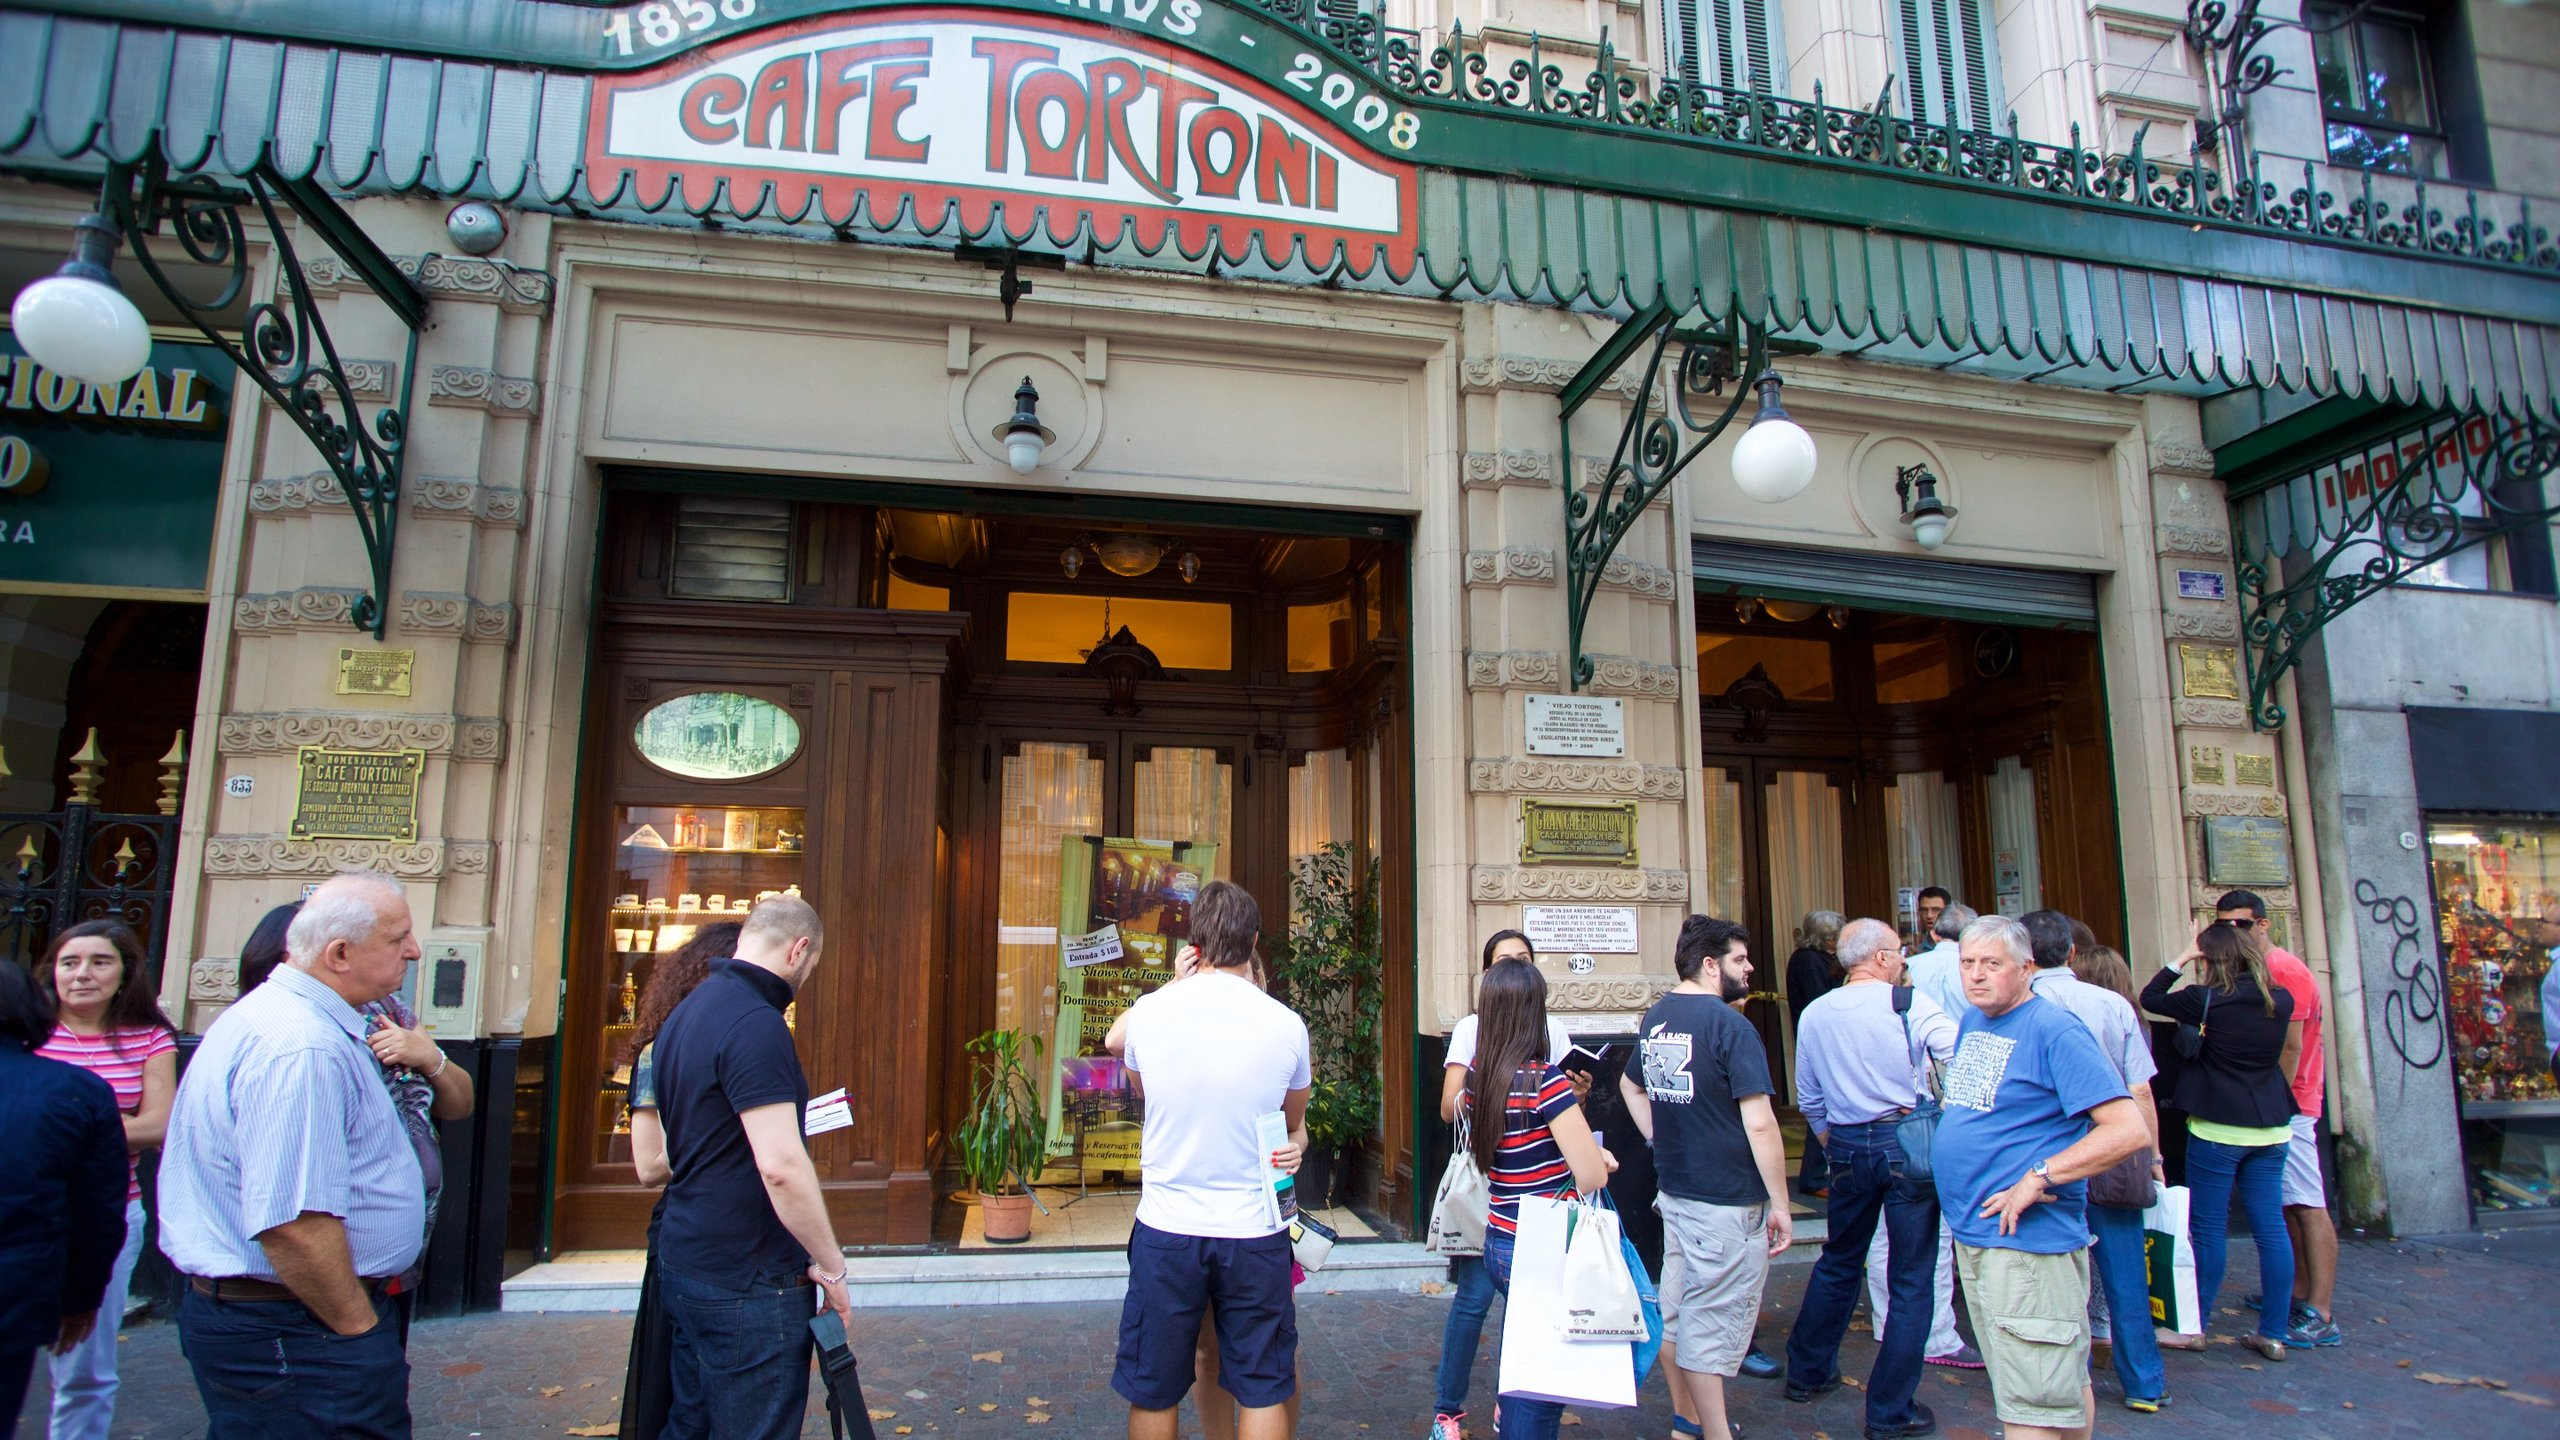 Cafe Tortoni, Buenos Aires, Argentinien